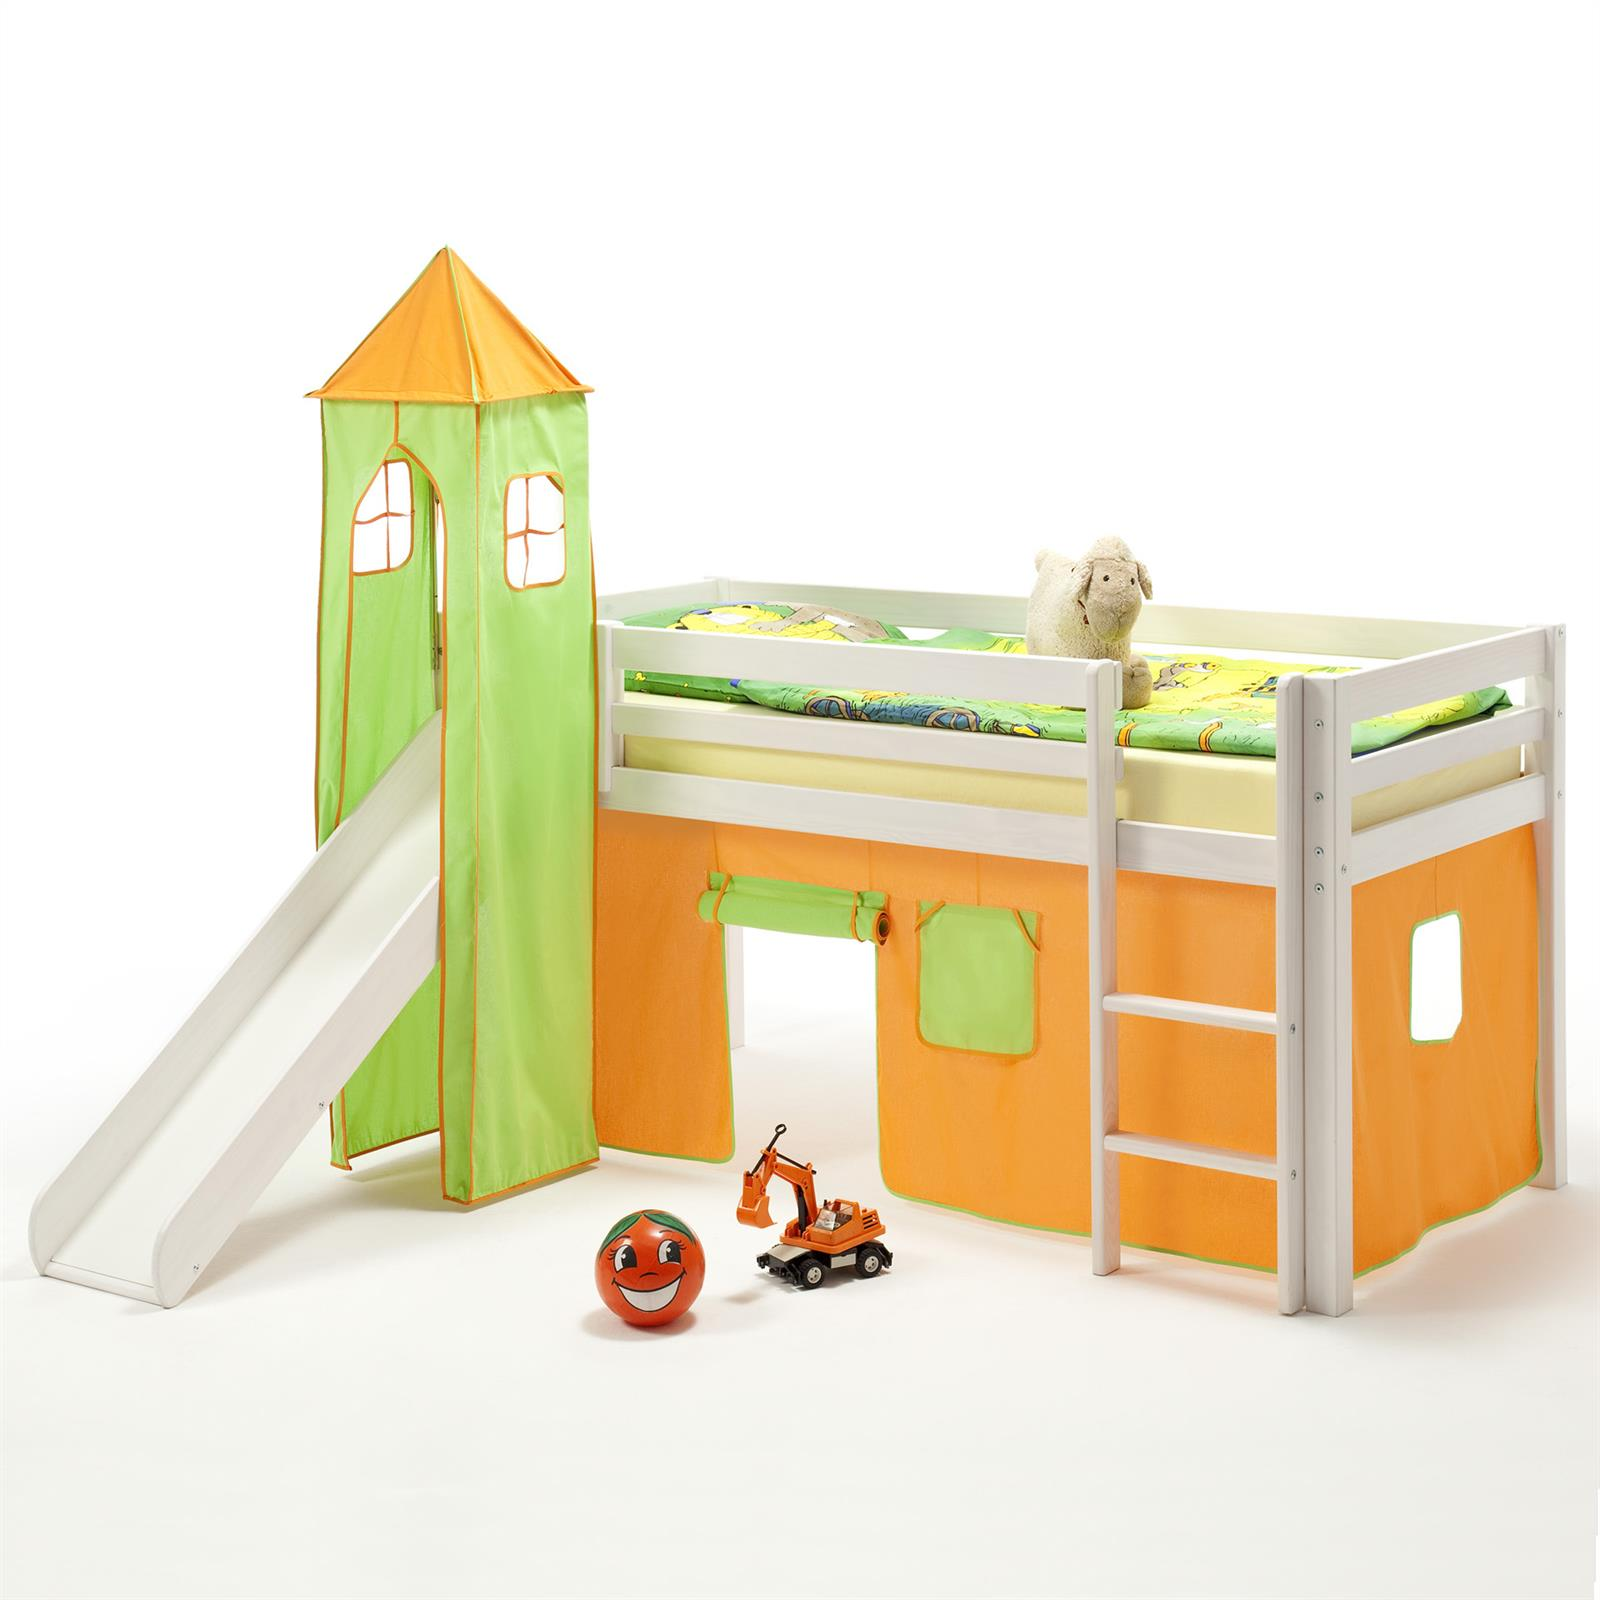 rutschbett max wei vorhang turm orange gr n mobilia24. Black Bedroom Furniture Sets. Home Design Ideas